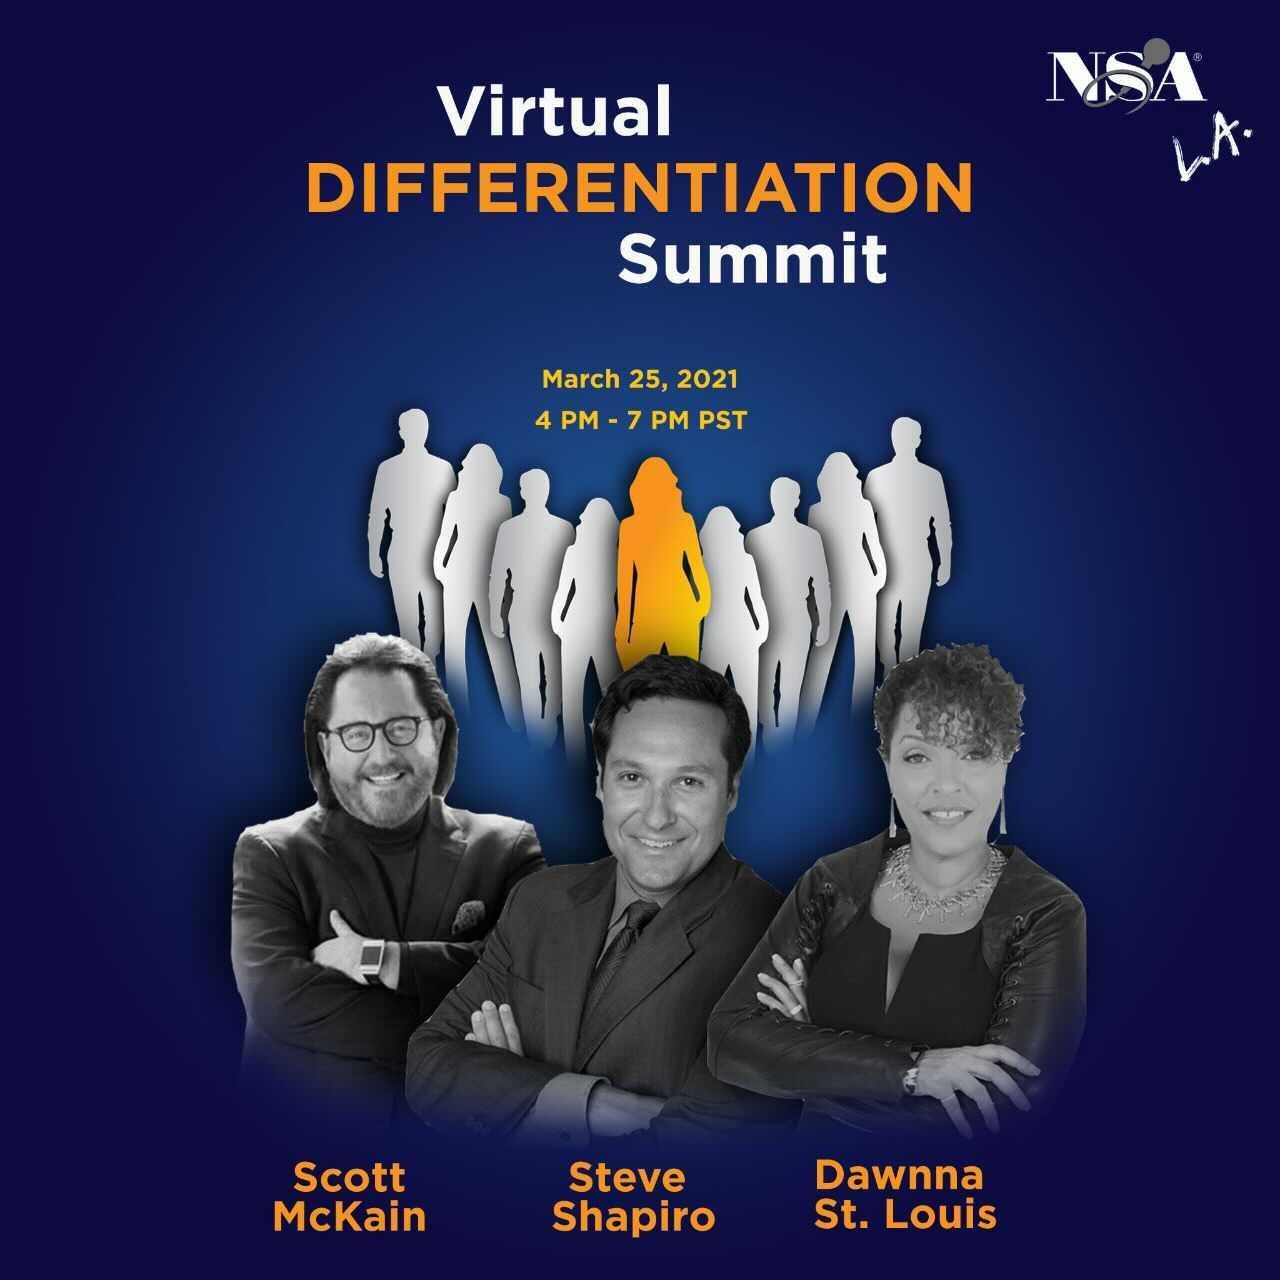 2021 Mar 25 Virtual Differentiation Summit Video